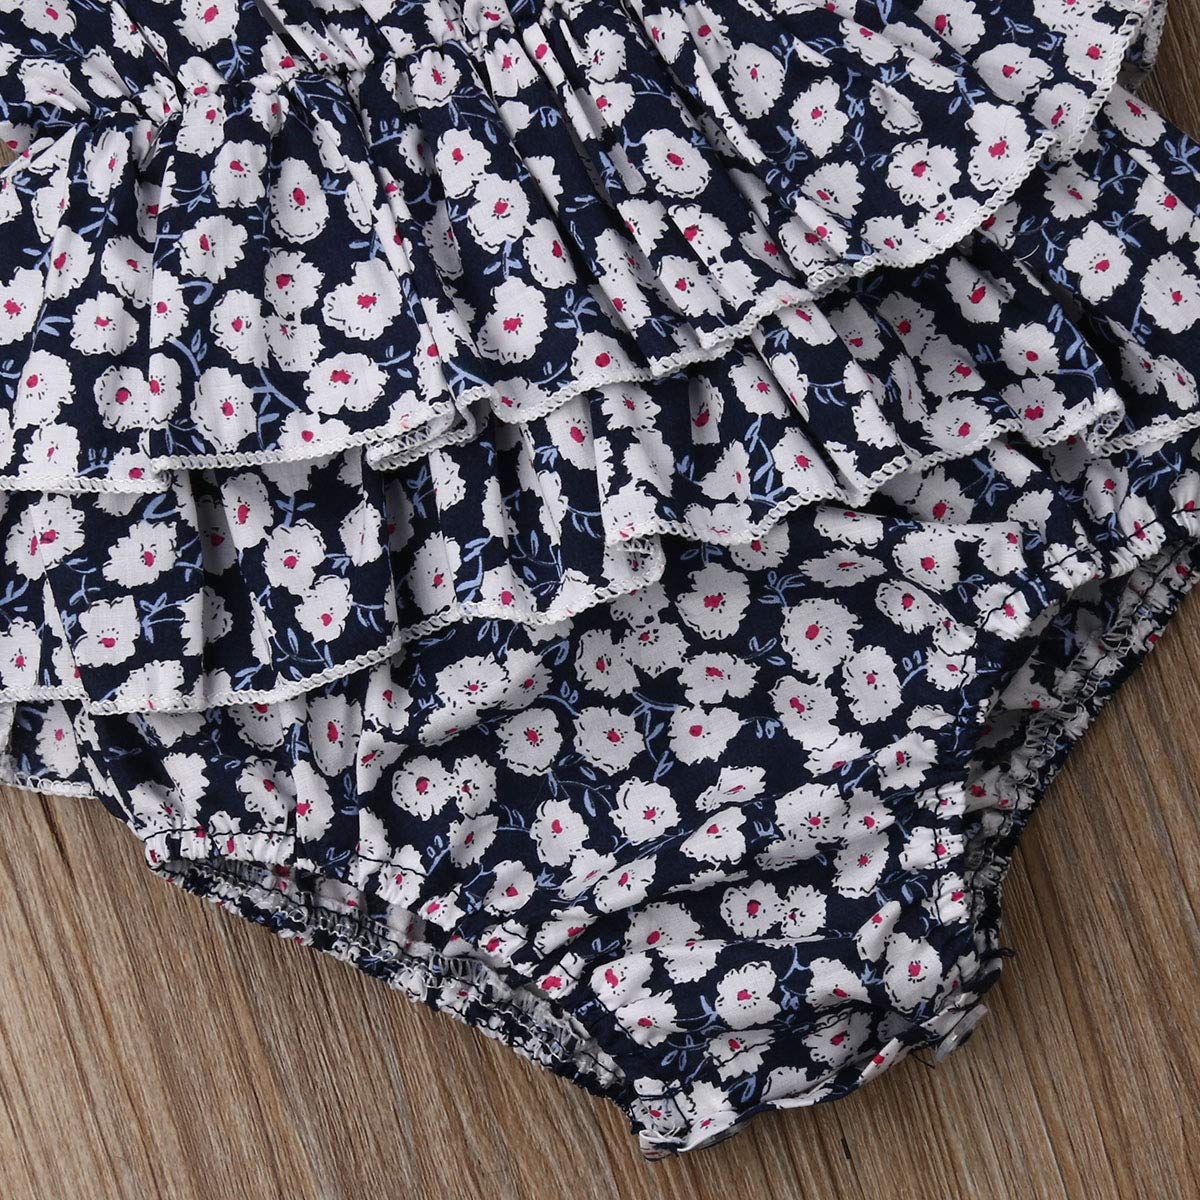 Lzxuan Newborn Baby Girl Romper Floral Print Vintage Jumpsuit Outfit Playsuit Clothes